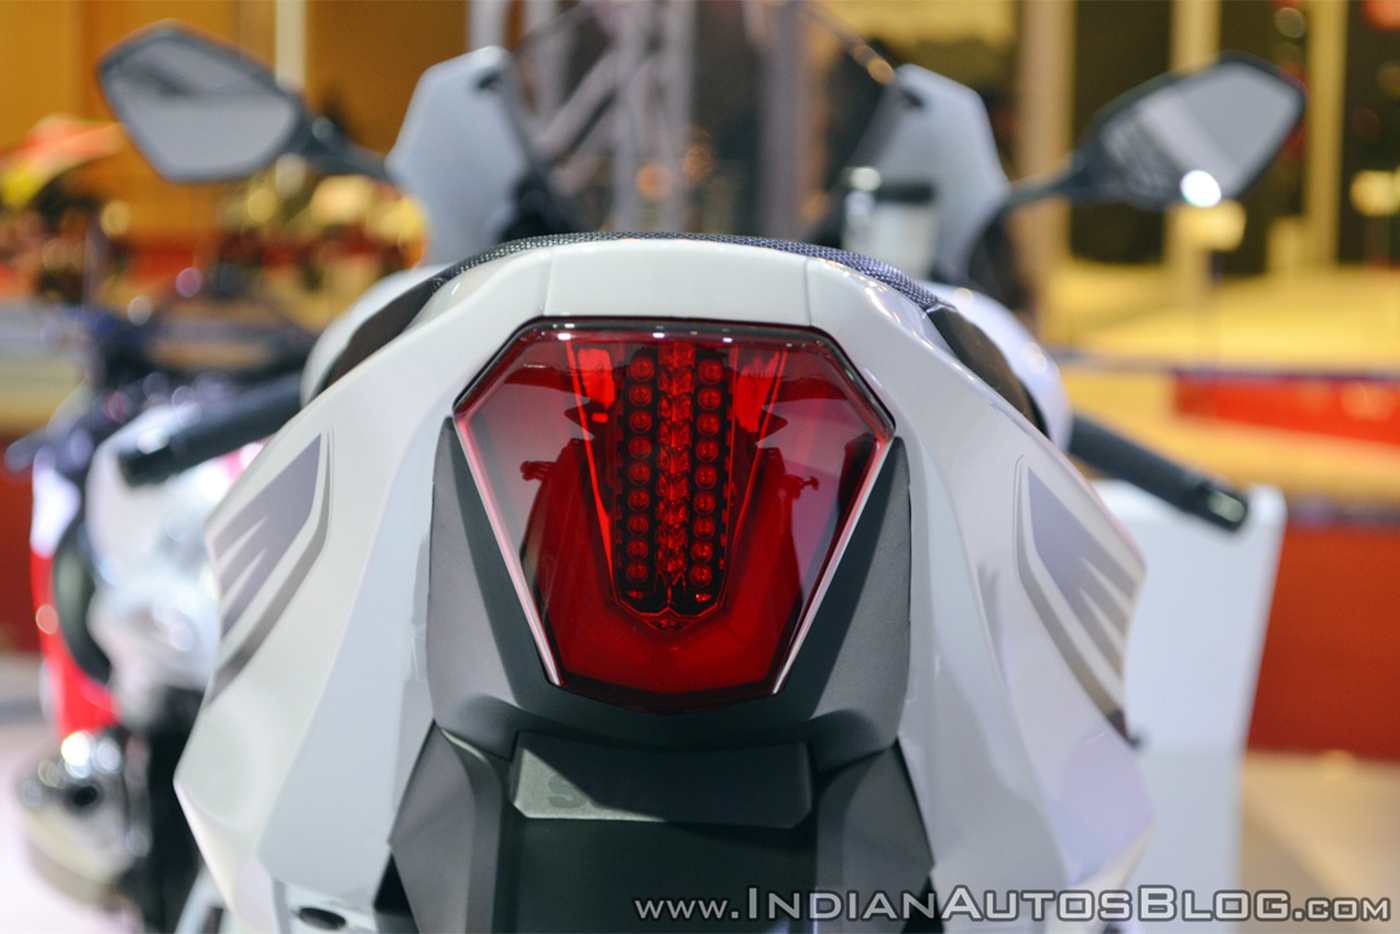 2018-suzuki-gsx-r1000r-white-tail-light-at-2018-auto-expo.jpg